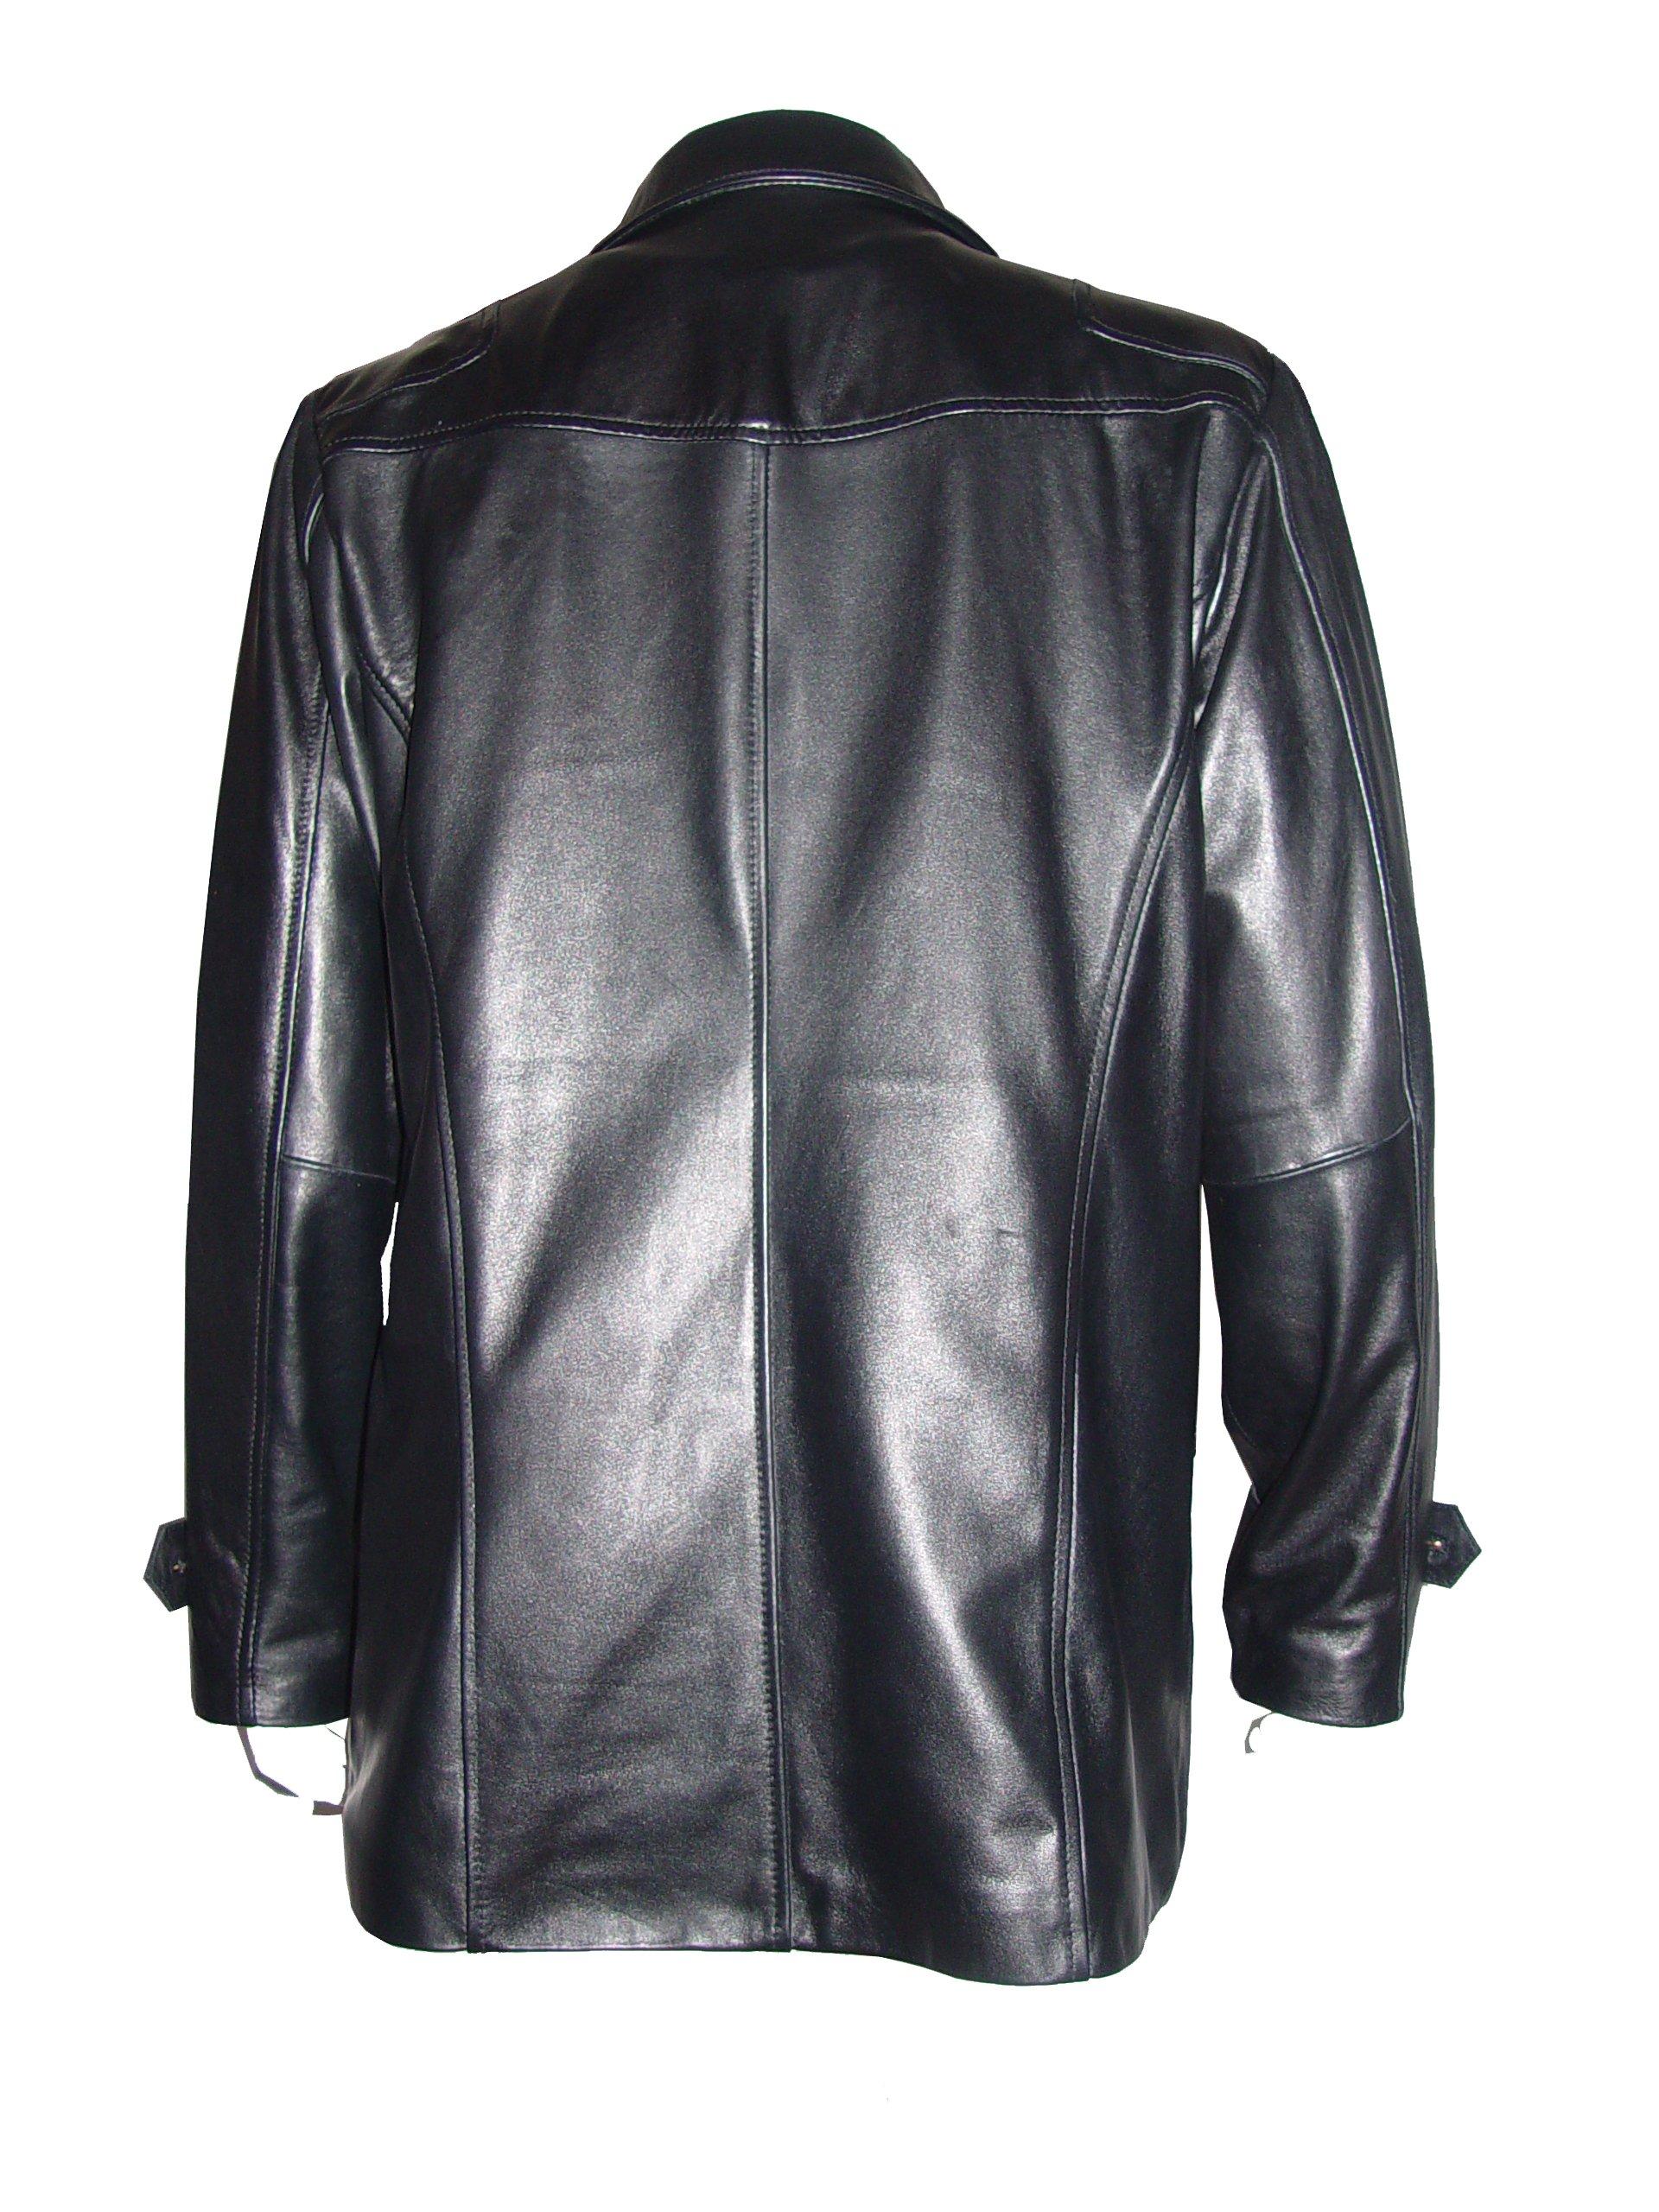 Nettailor Tall Big Man 1070 BIG TALL Size 4 Season Leather Fancy Casual Blazer by NETTAILOR (Image #2)